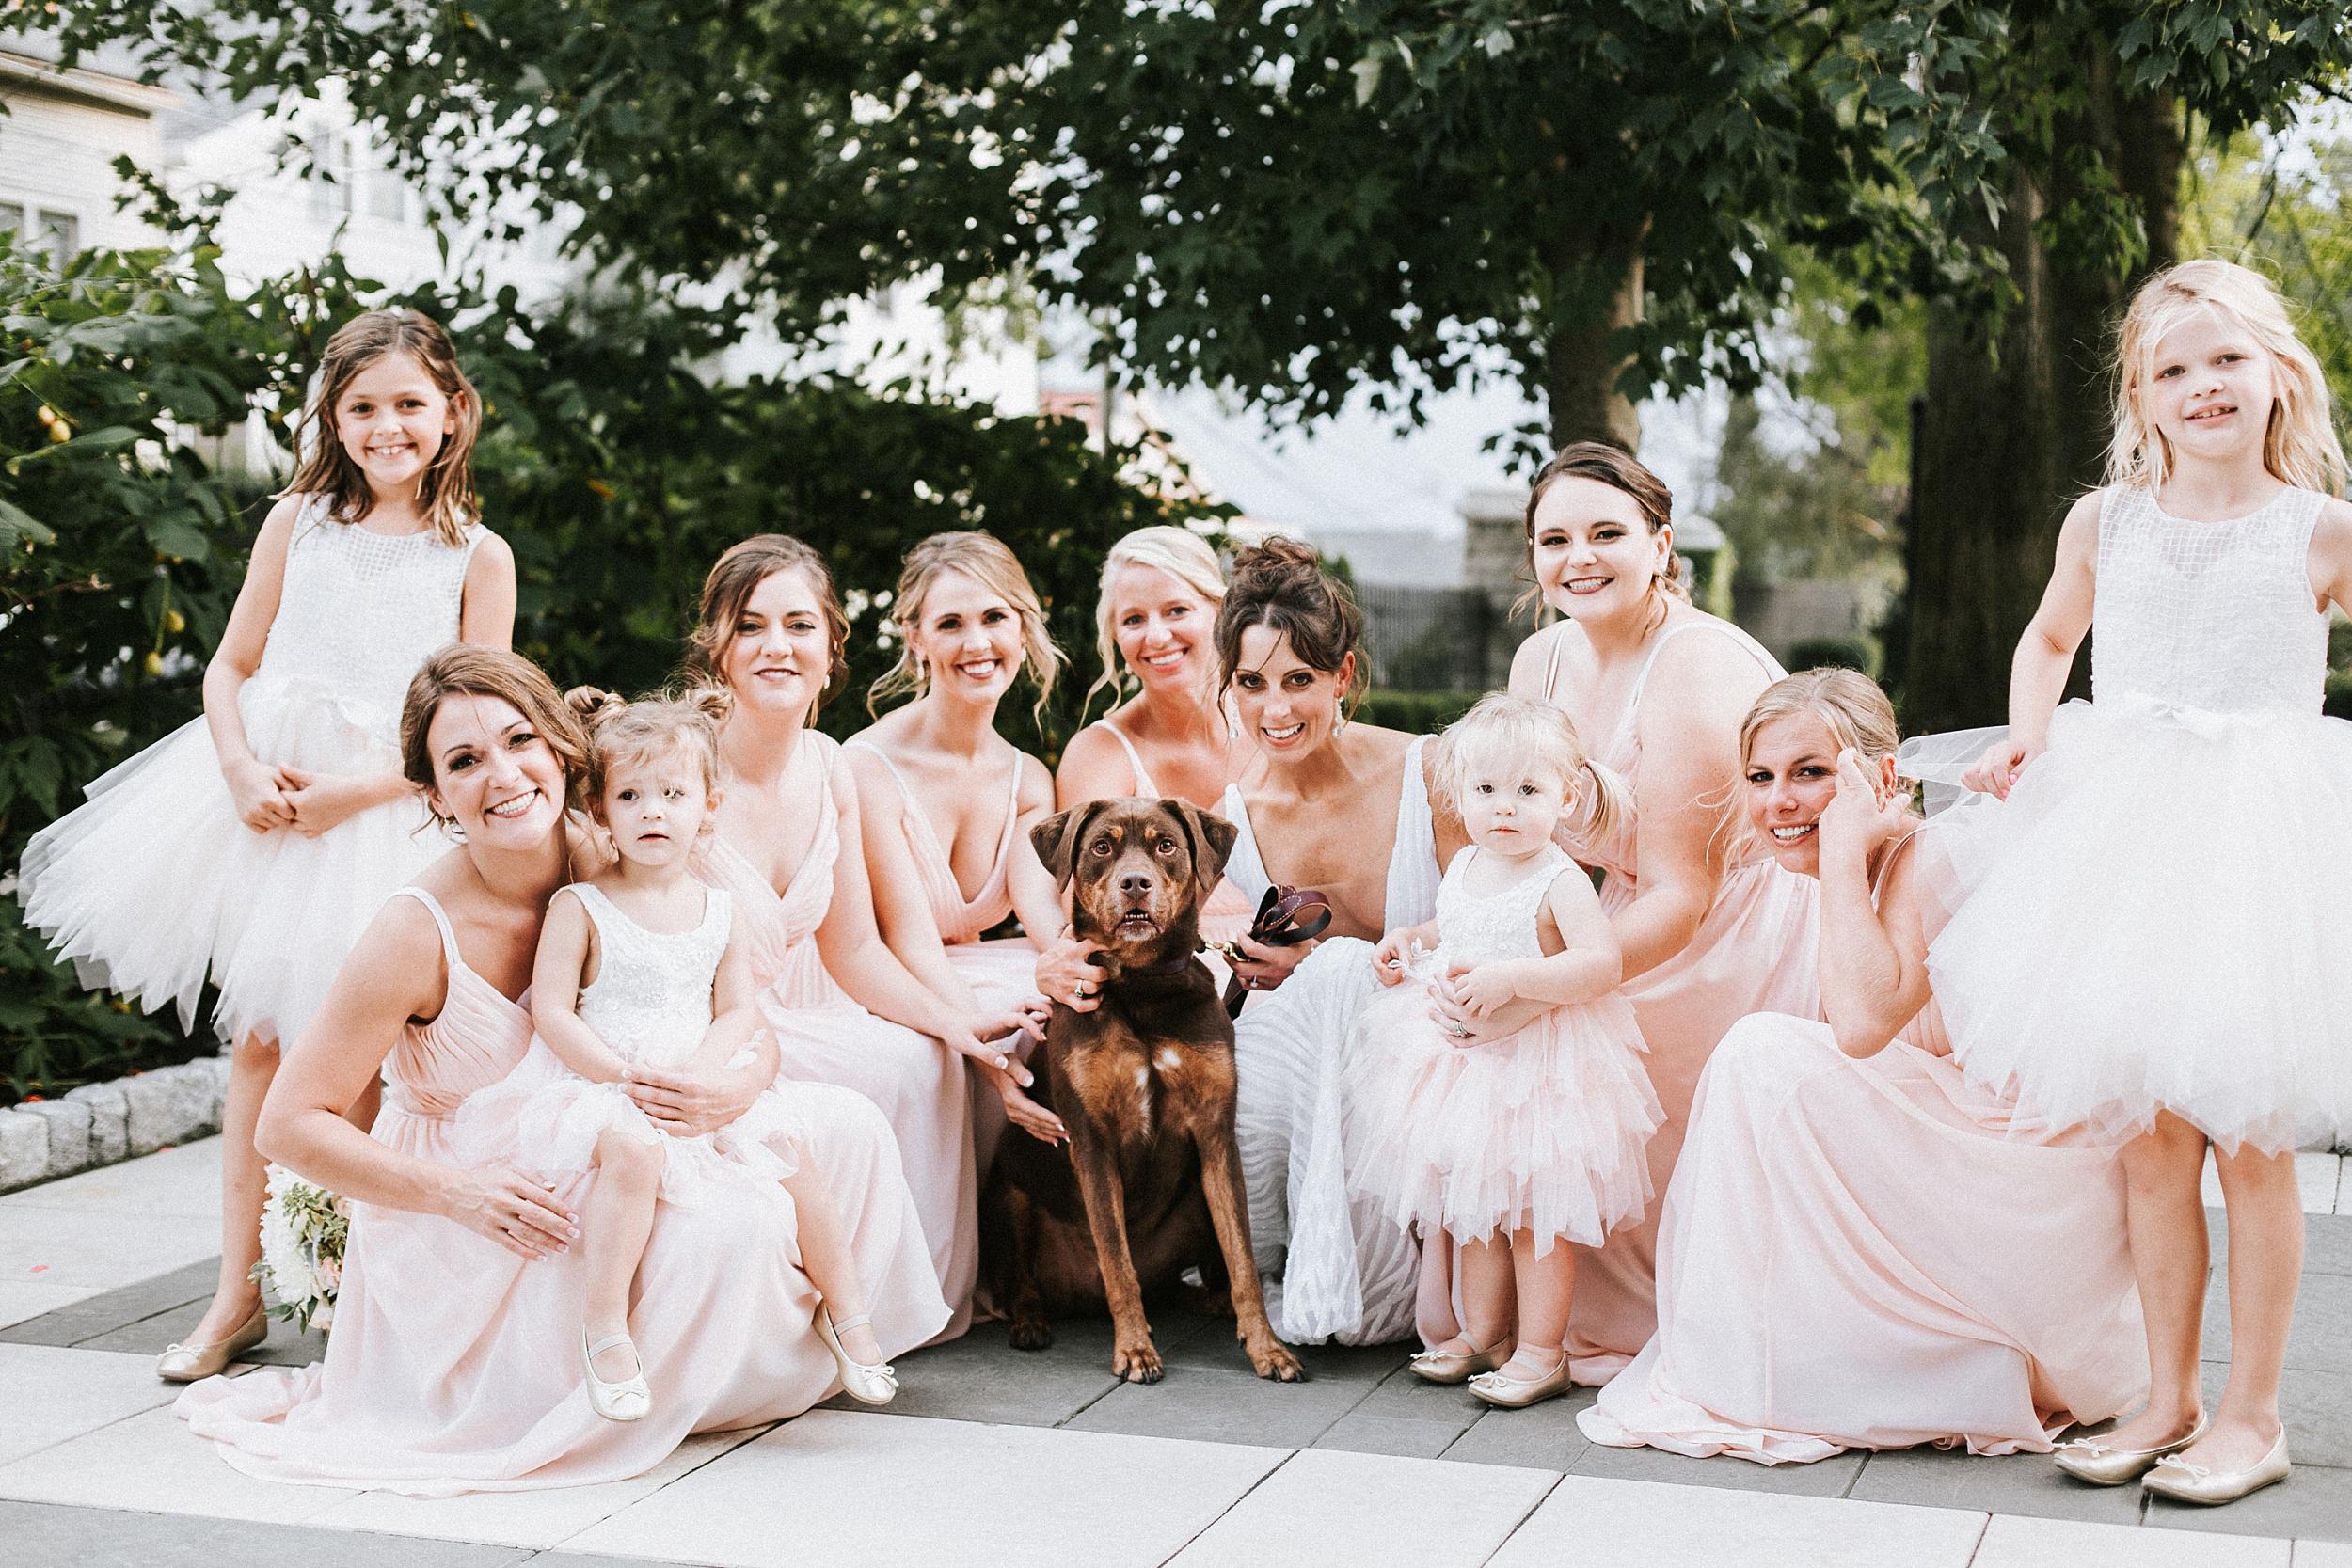 Brooke Townsend Photography - Cincinnati Wedding Photographer (74 of 170).jpg